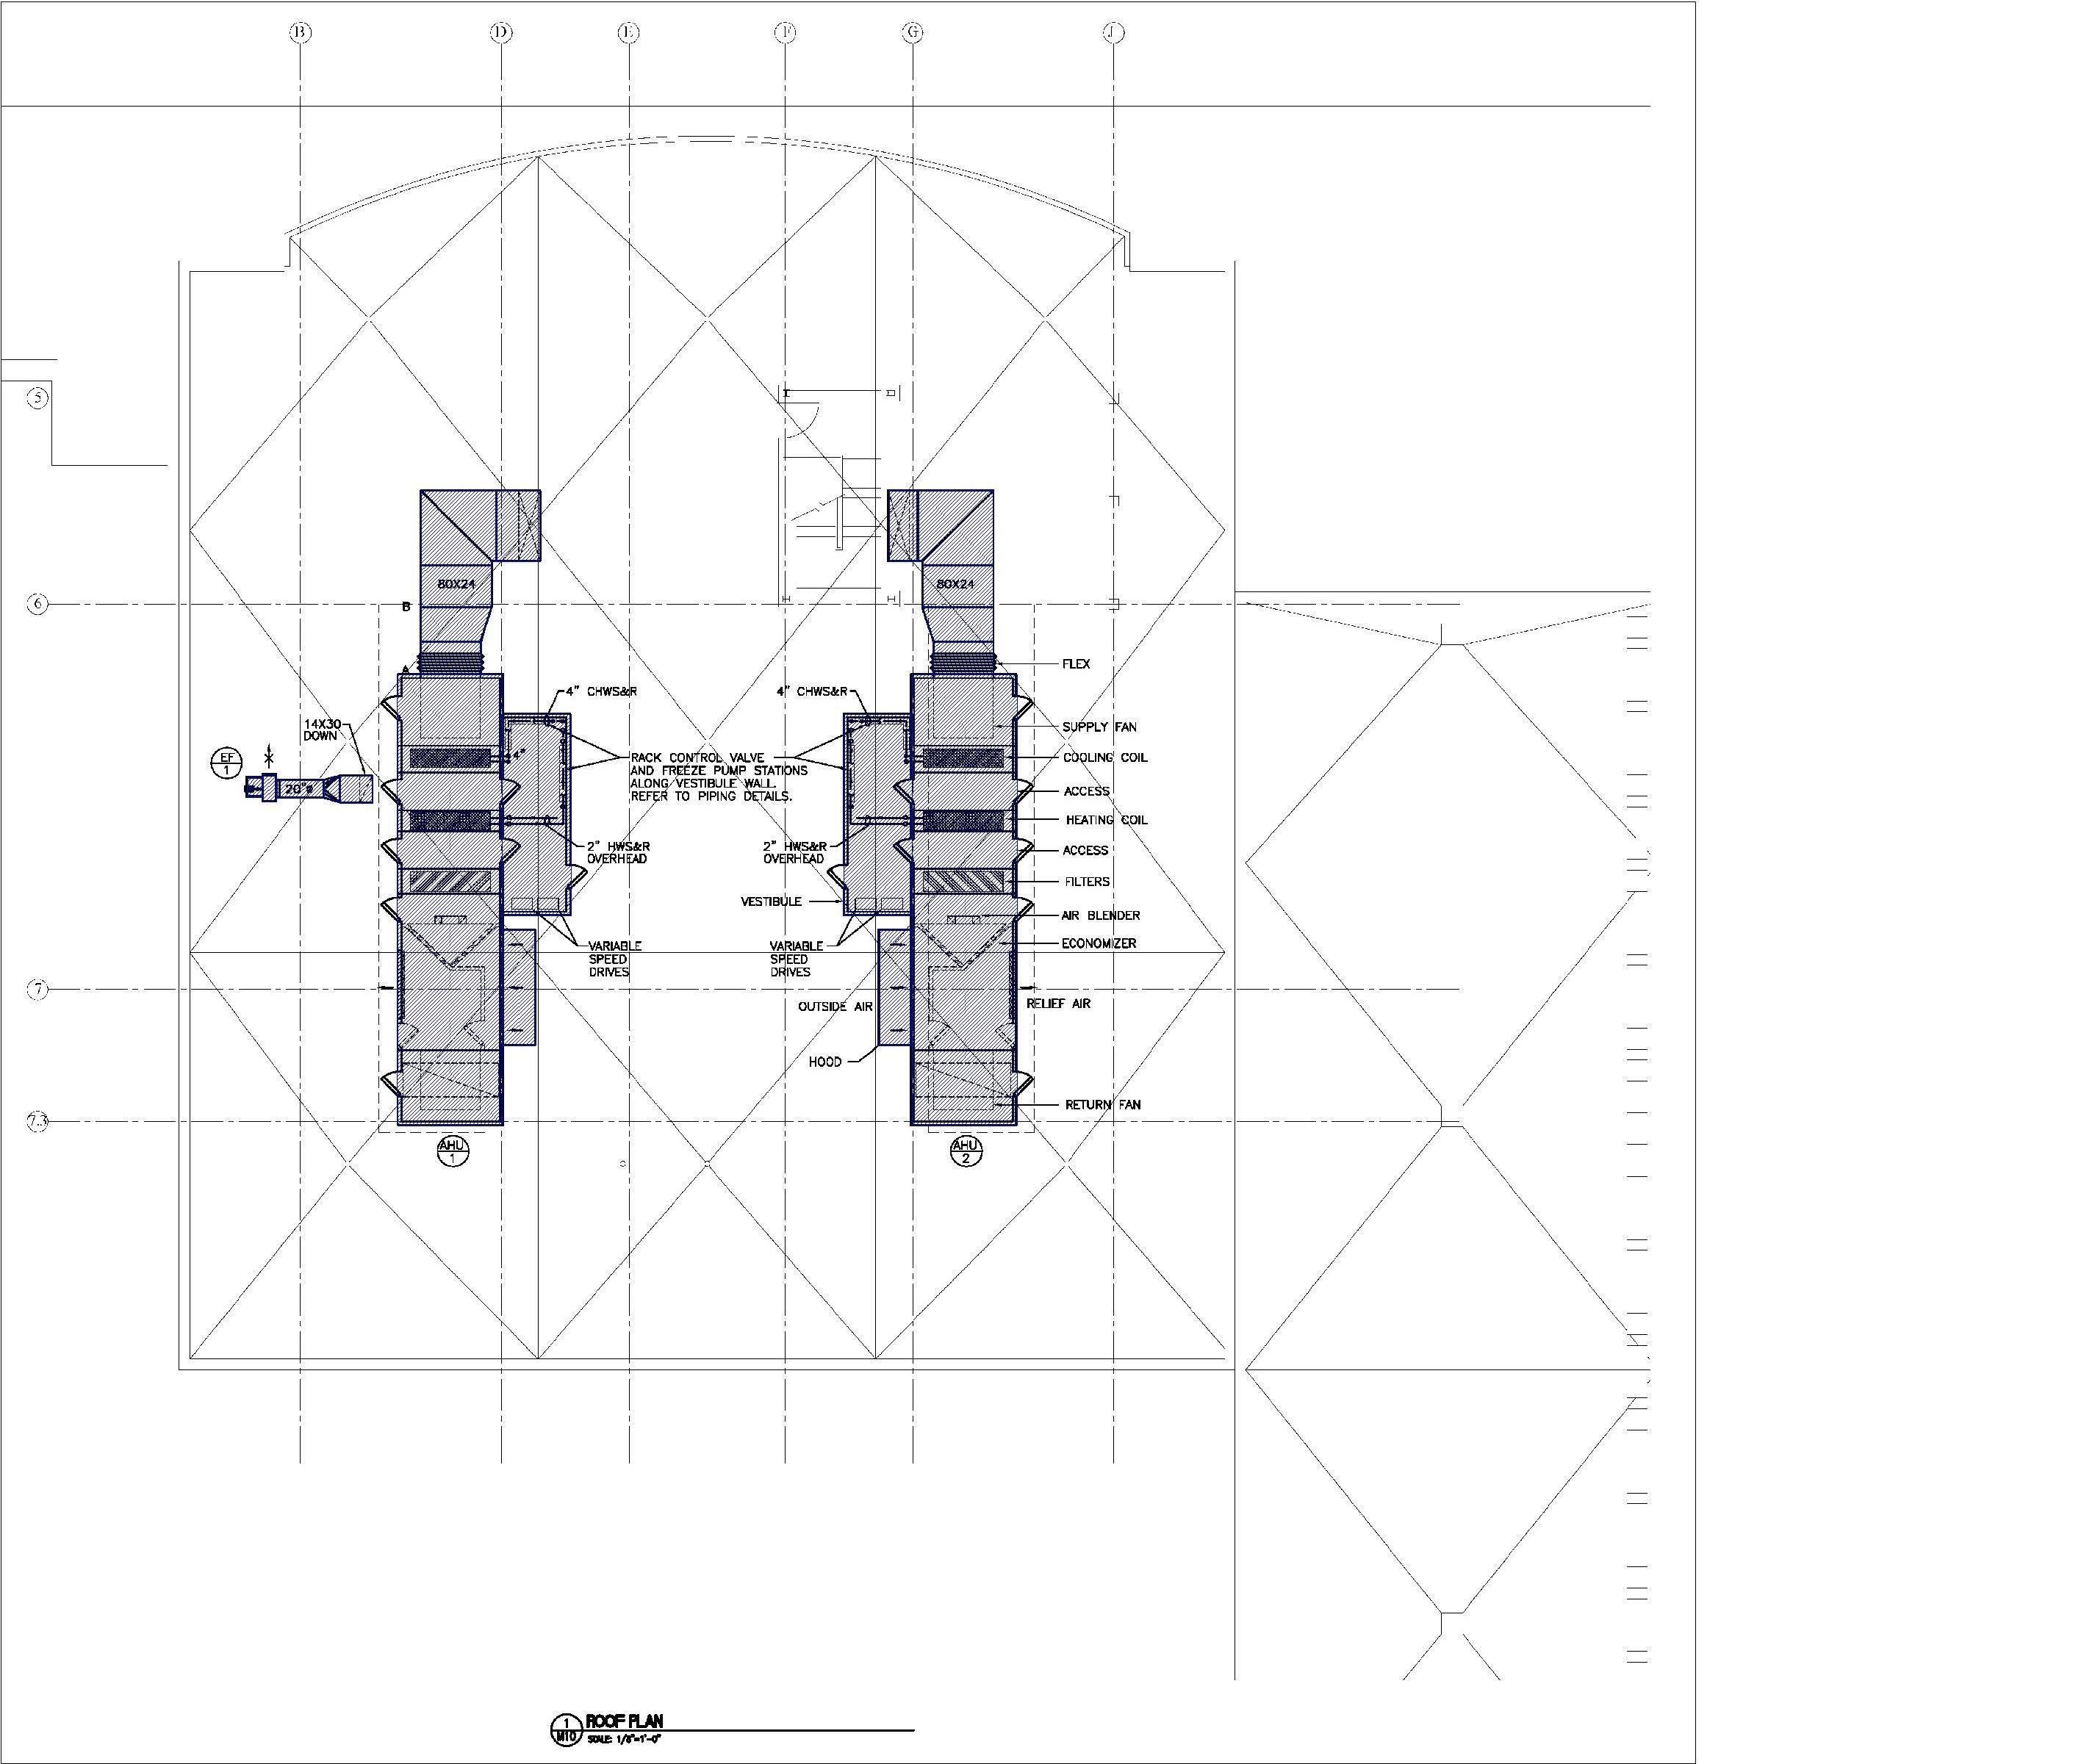 floorplan ae390final #323049